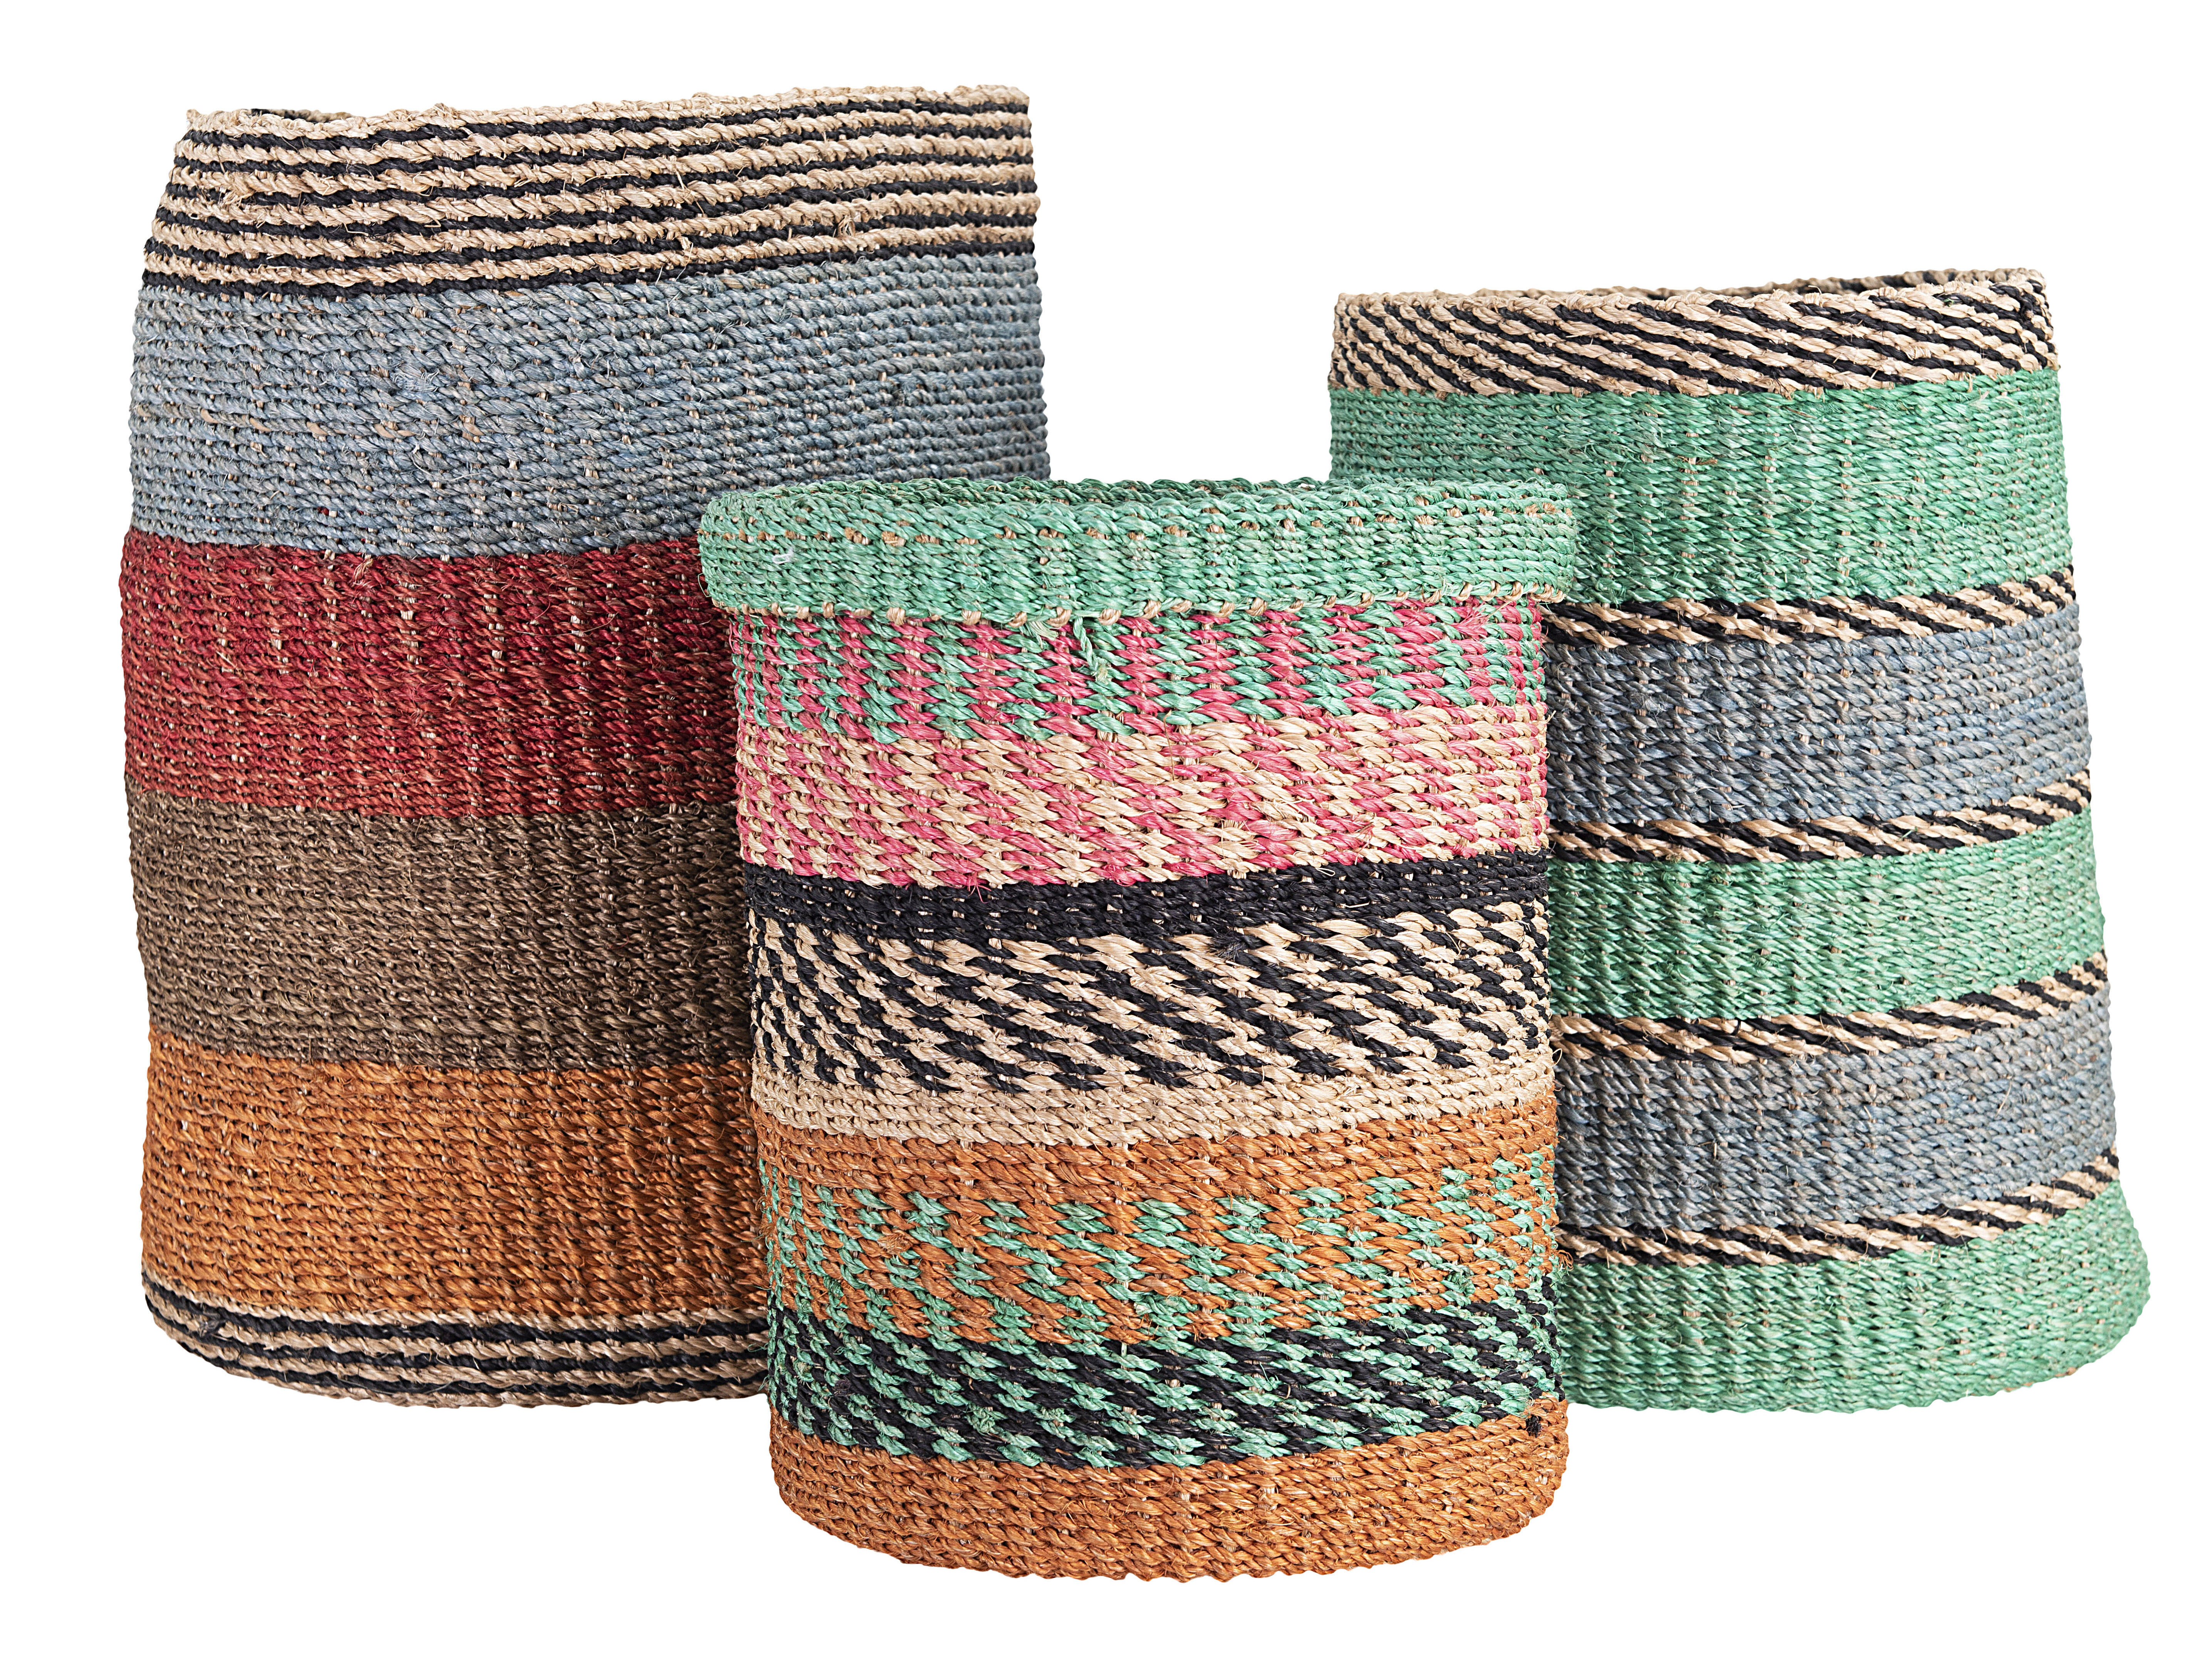 Abaca Stripes 3 Piece Wicker Rattan Basket Set Reviews Allmodern